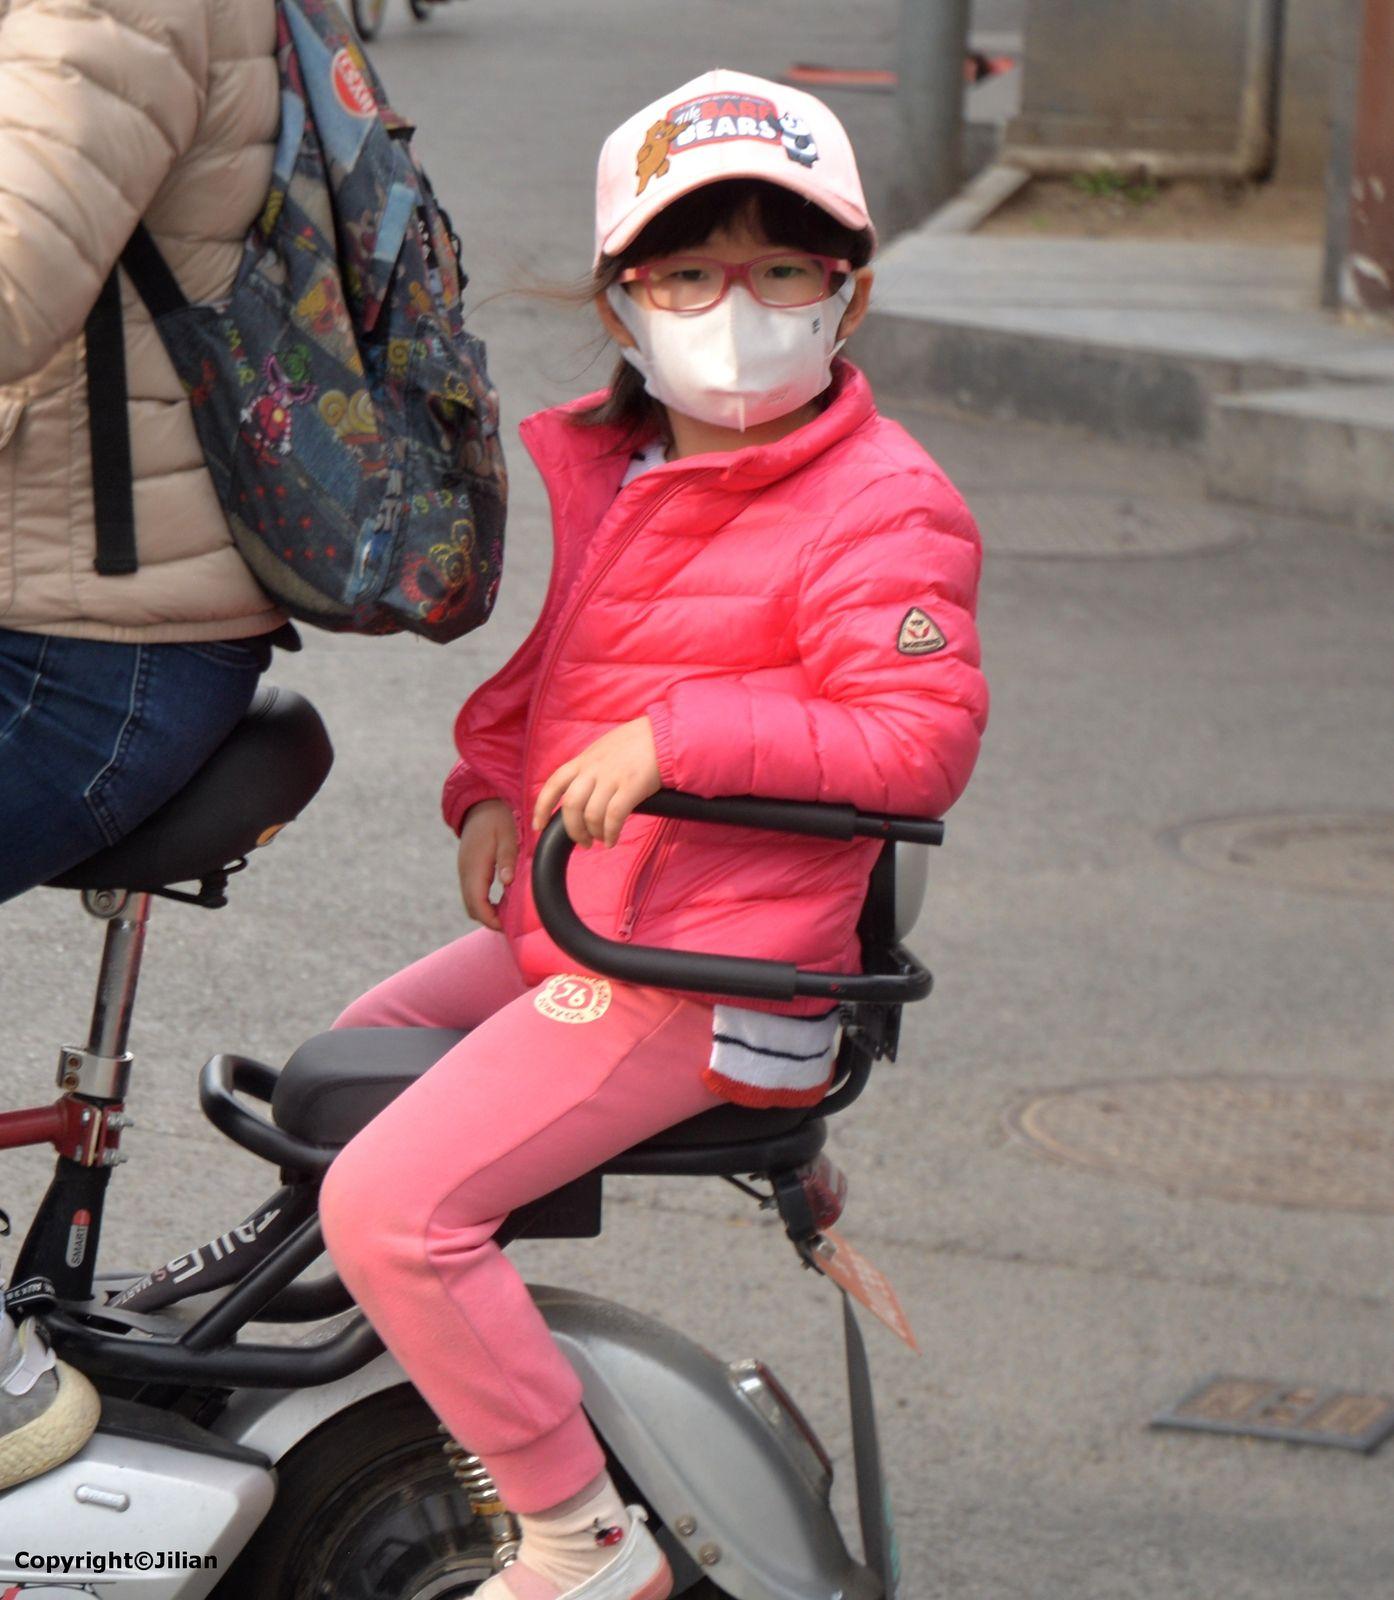 Beijing au temps du coronavirus. 8 - 冠状病毒时代的北京. 8